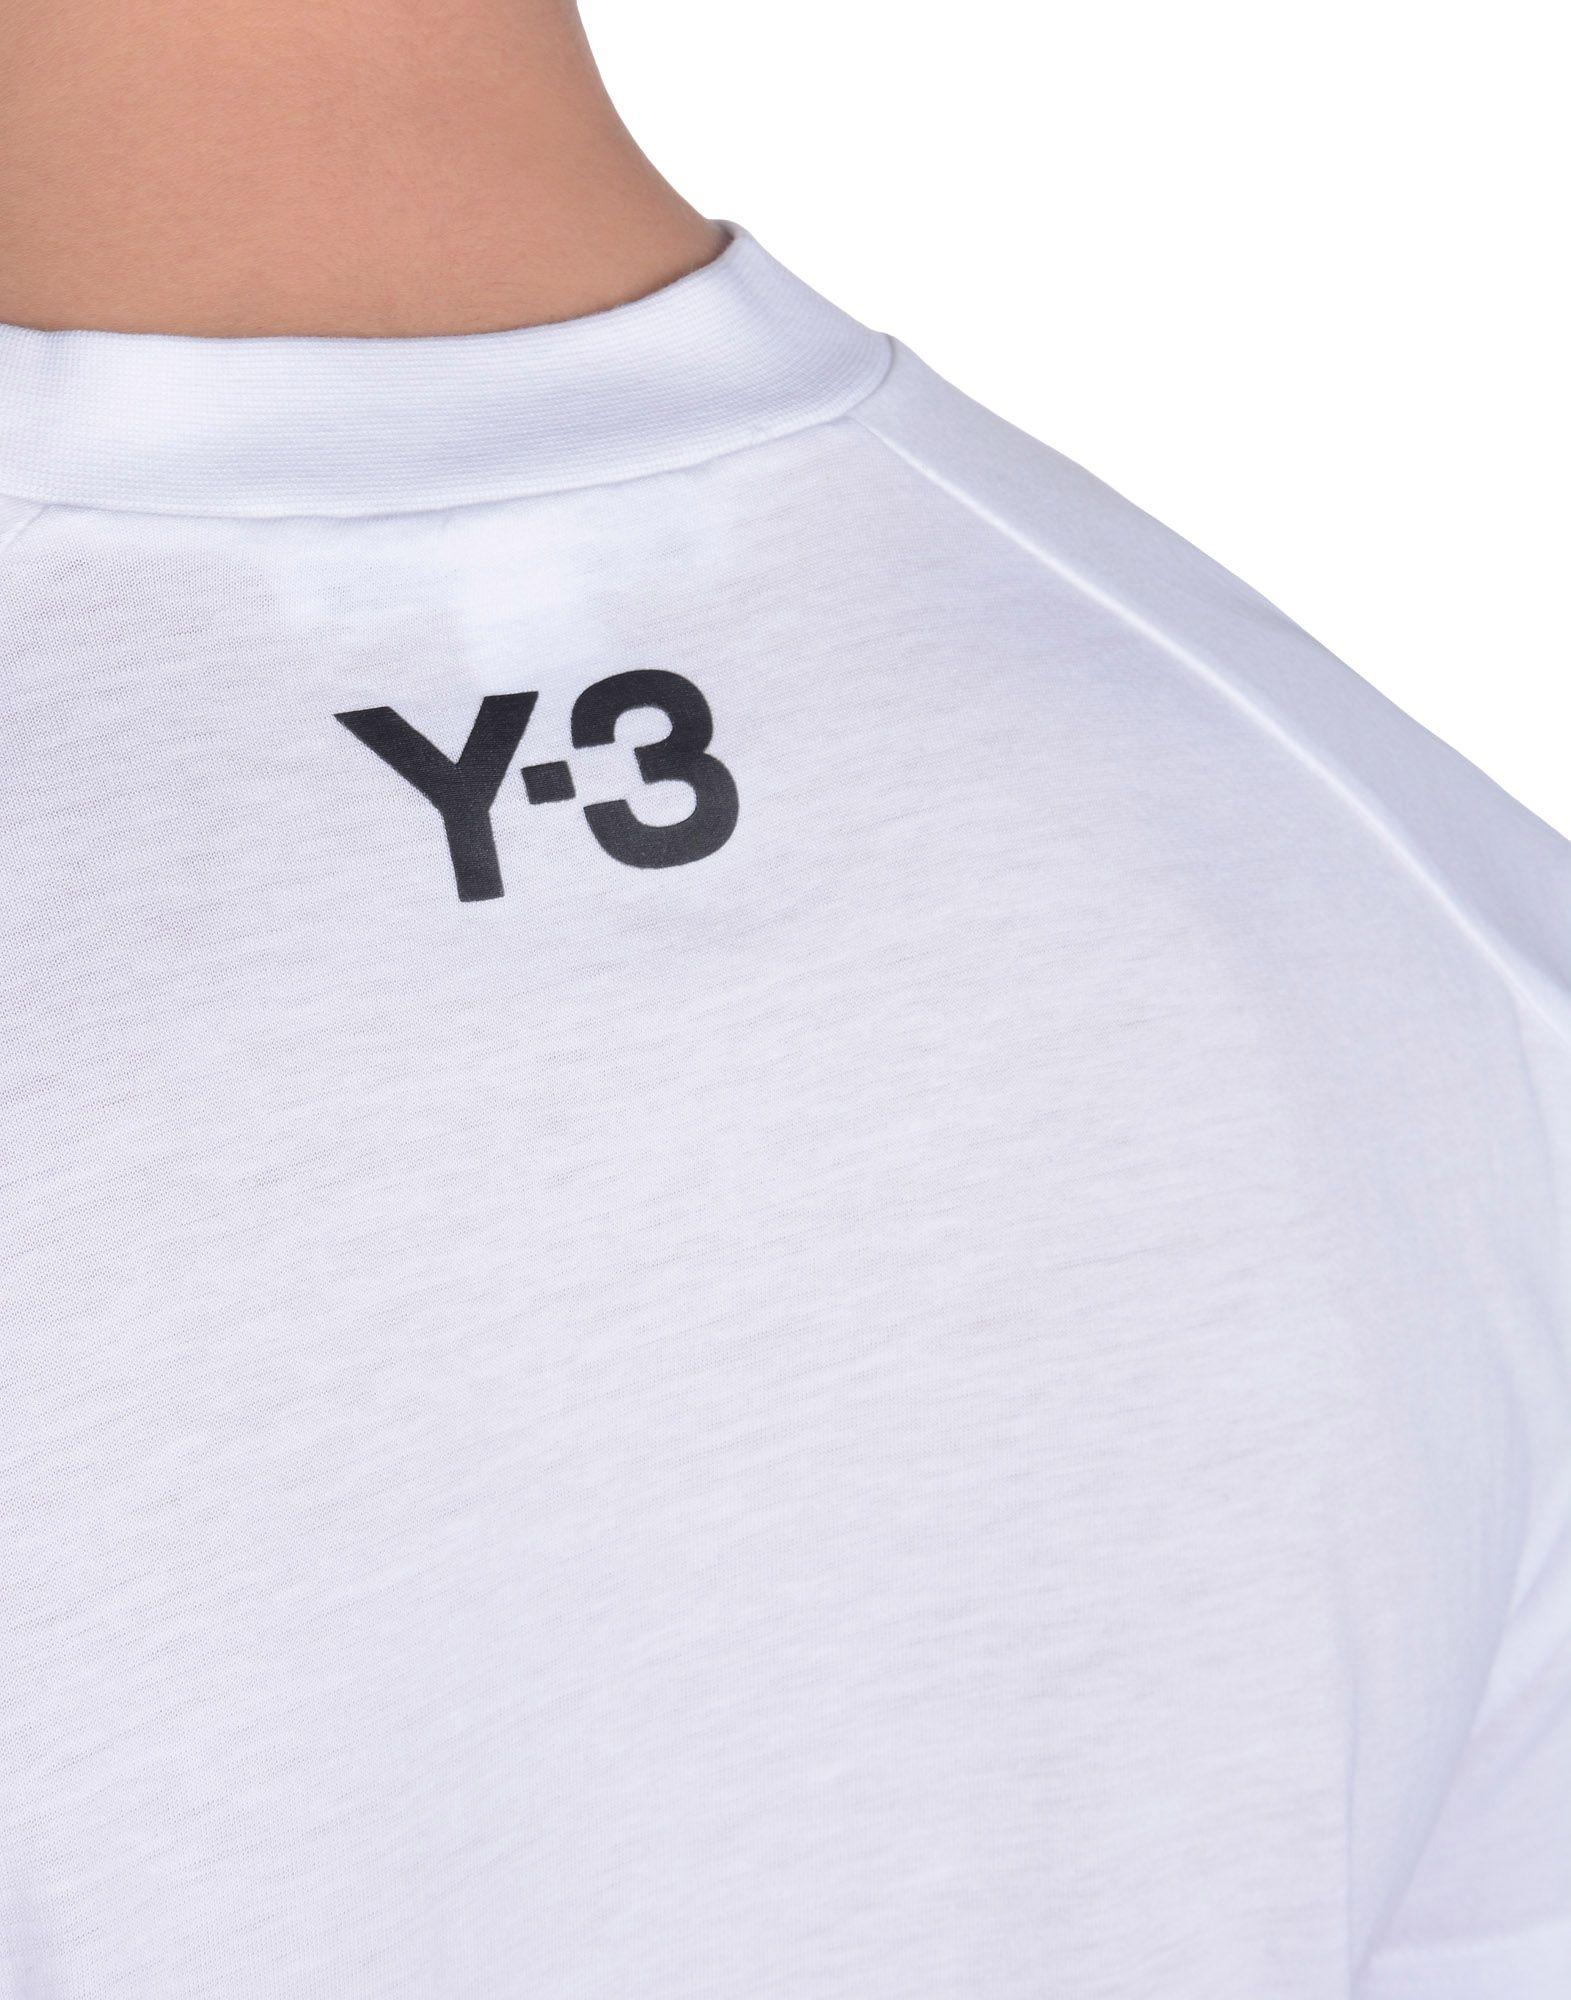 Y-3 TECH LOGO TEE TEES & POLOS man Y-3 adidas